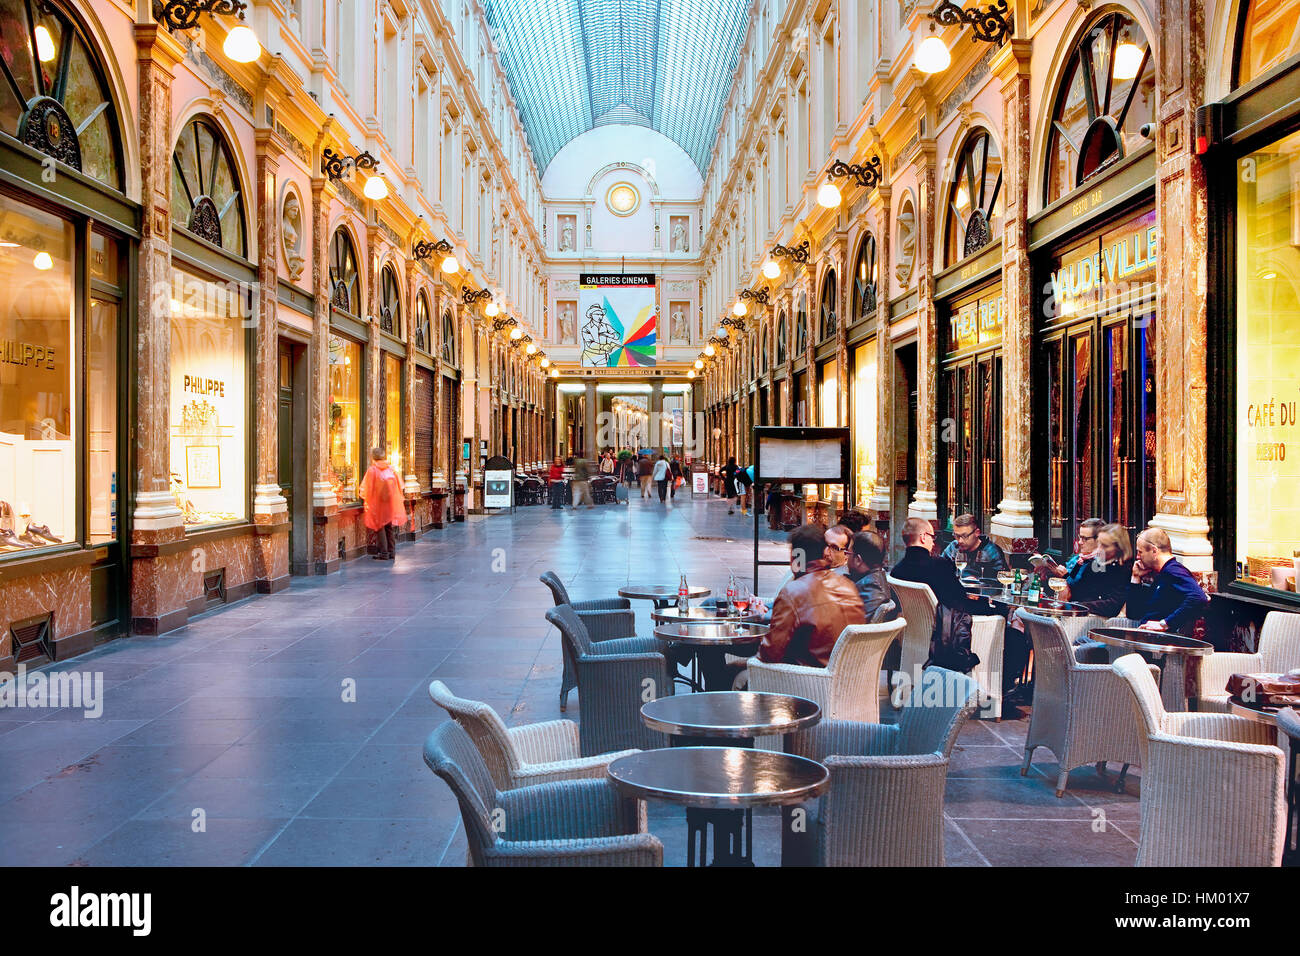 St-Hubert galleries in Brussels - Stock Image